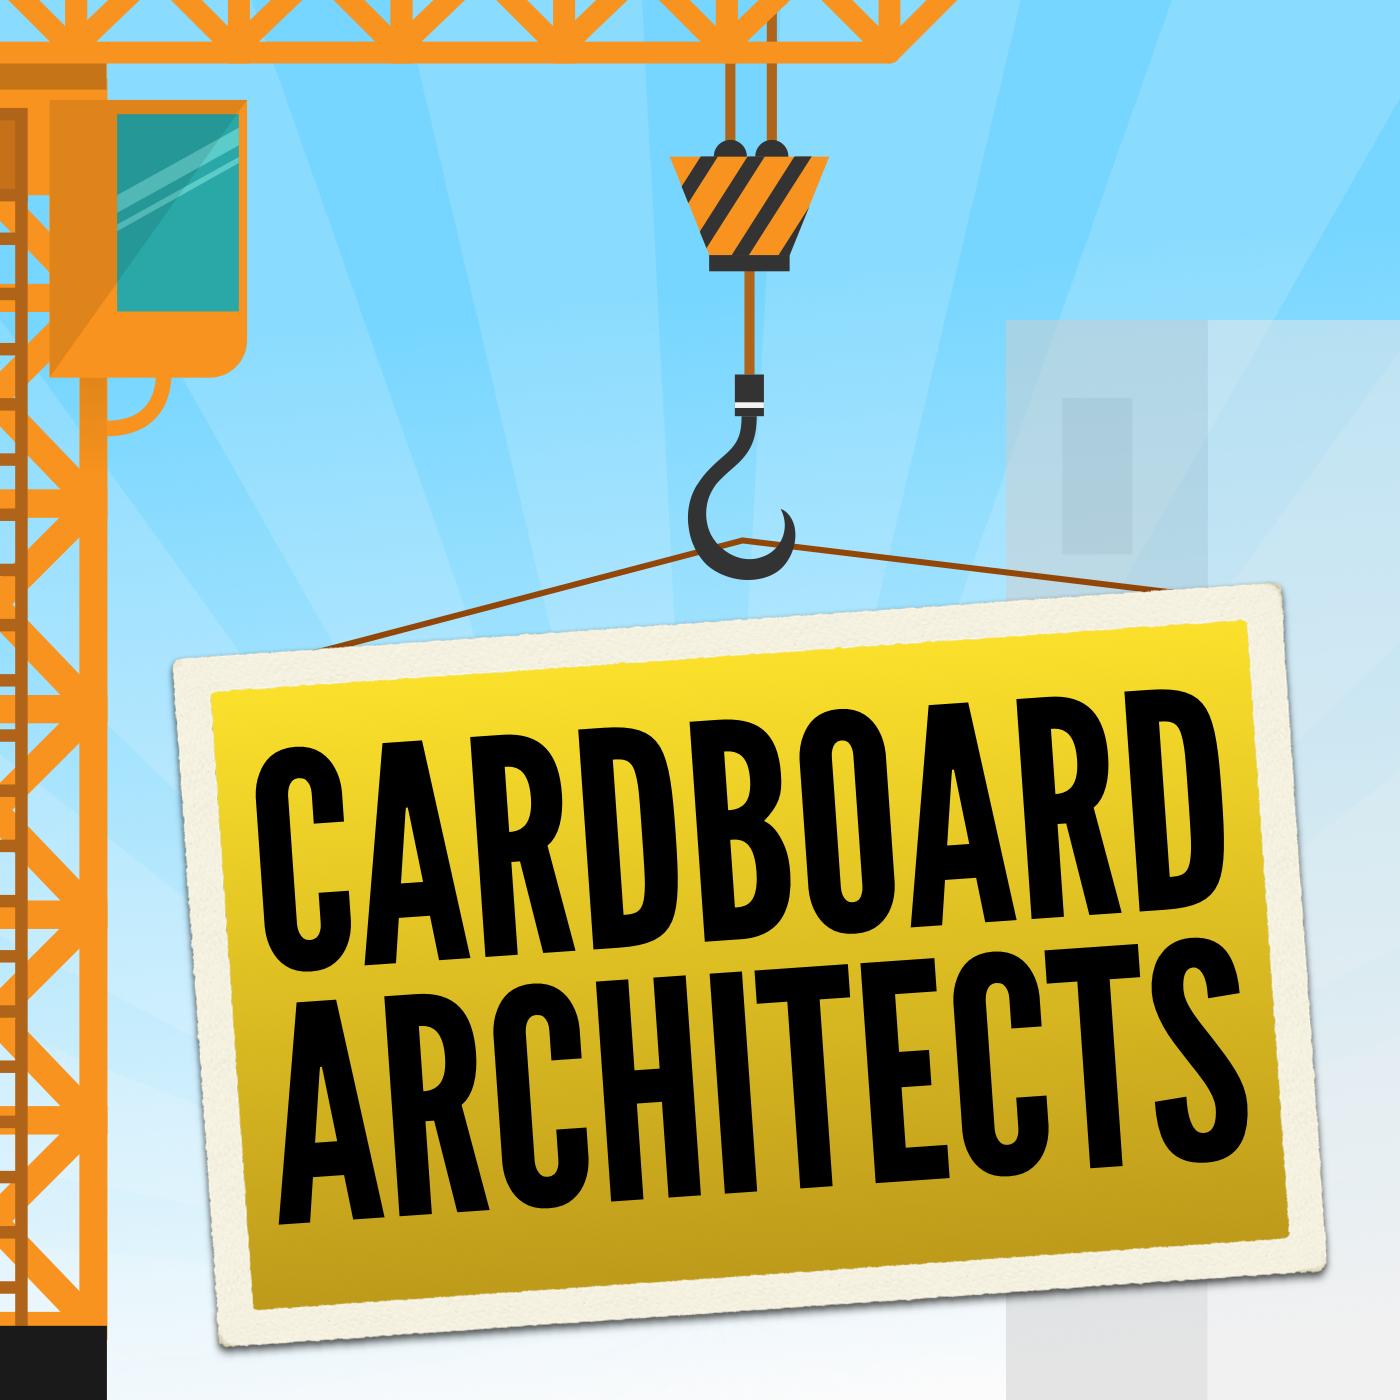 Cardboard Architects